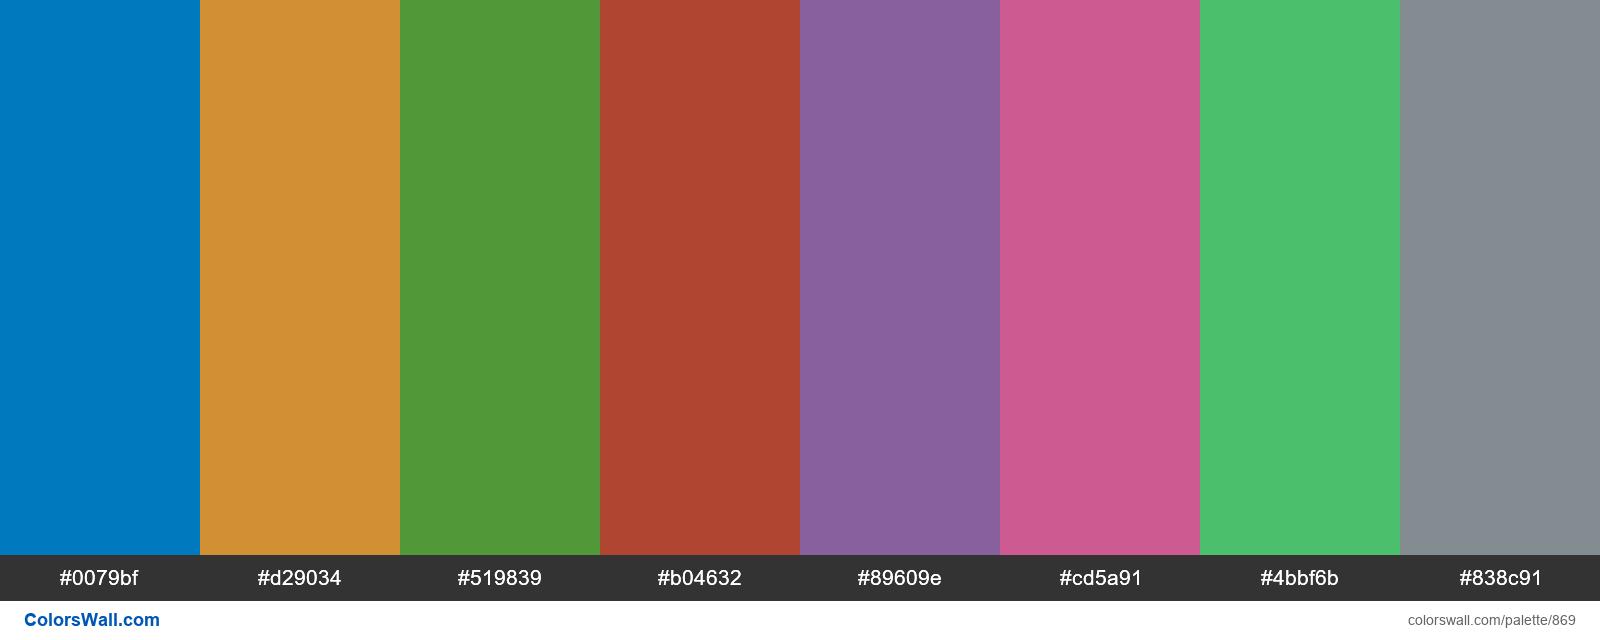 Trello Board backgrounds color palettes - #869